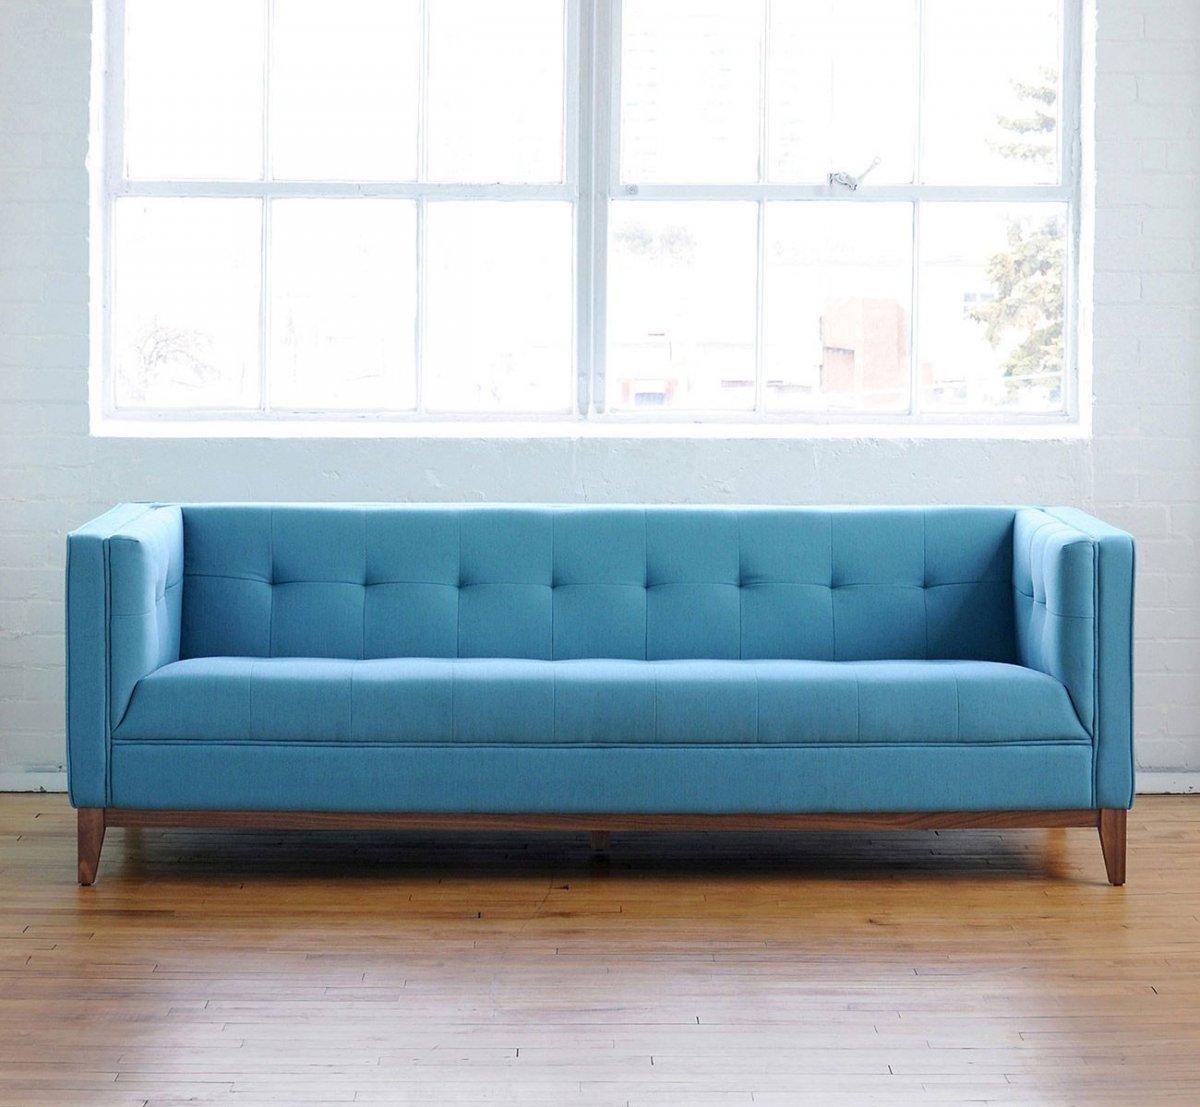 Atwood Sofa, Muskoka Surf.